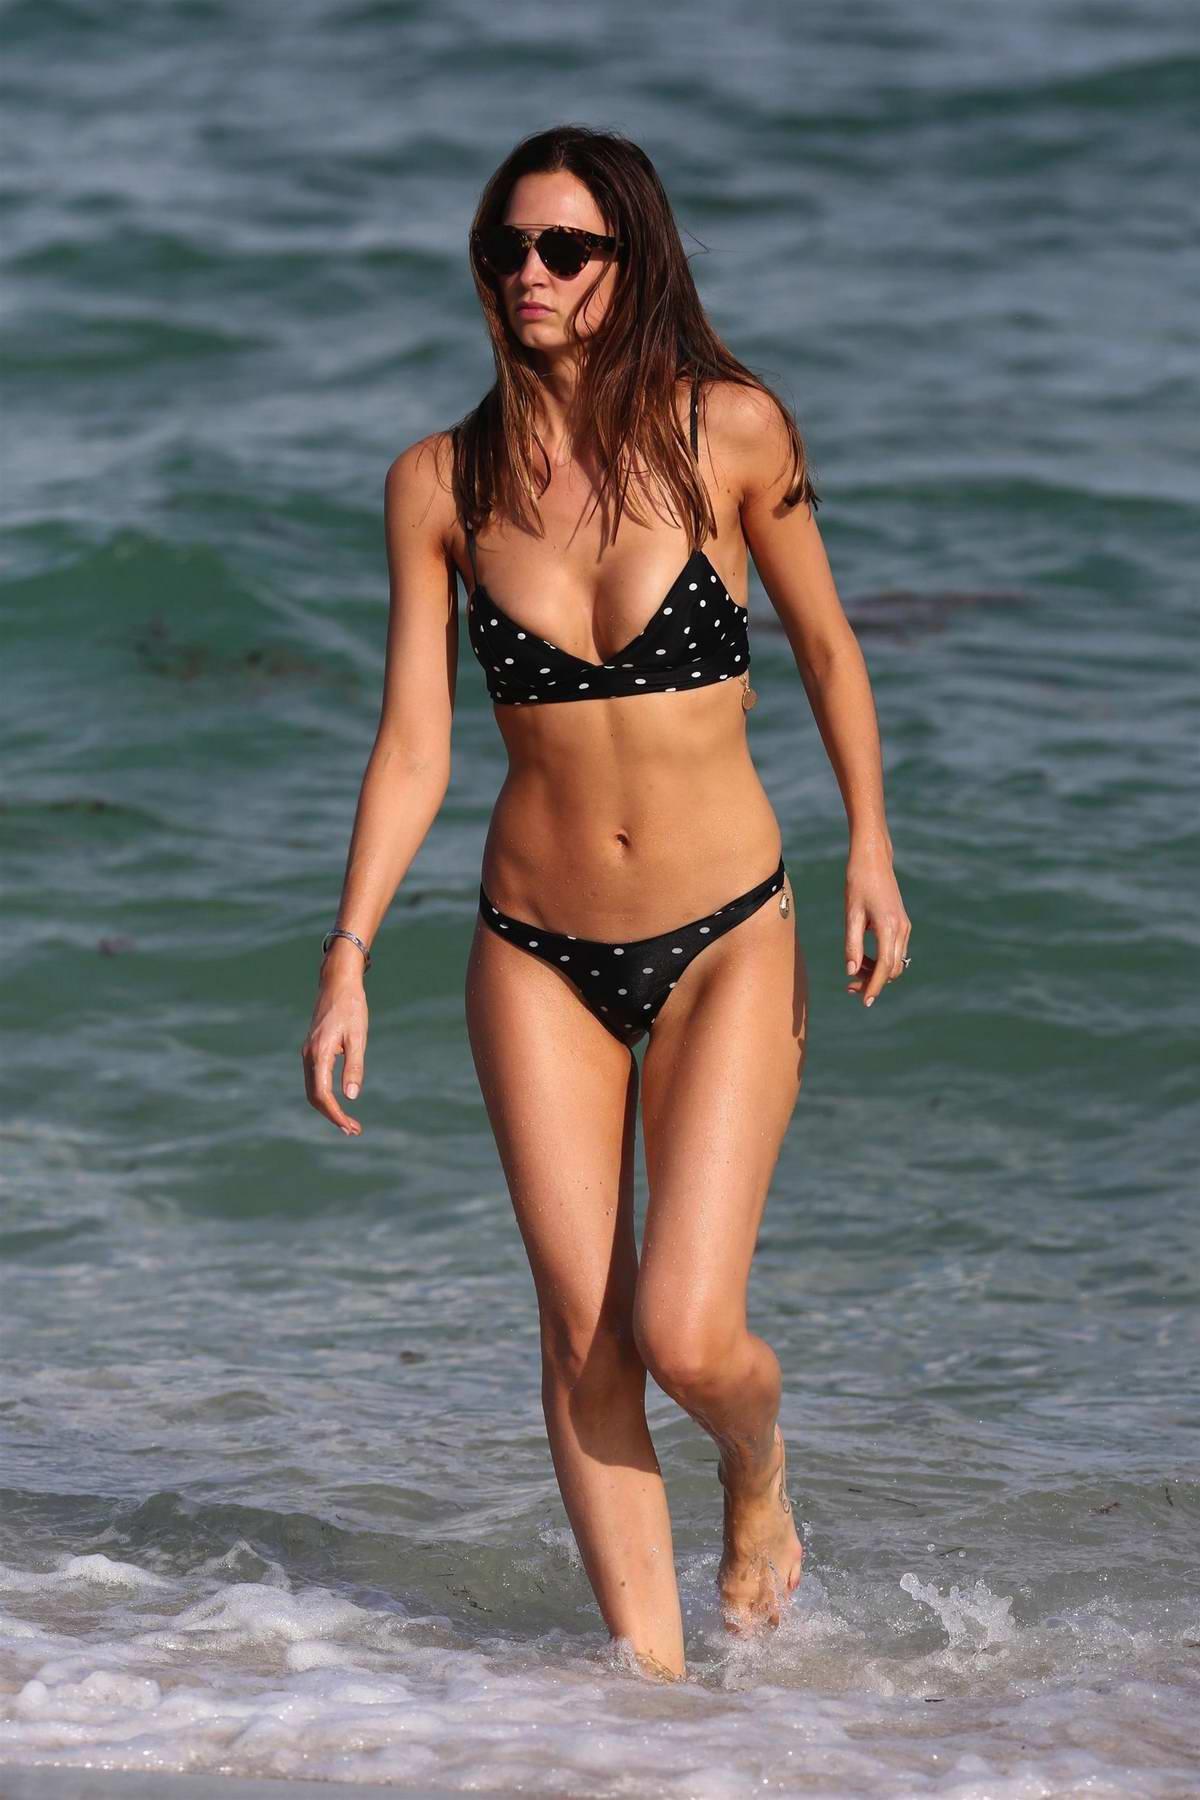 Amy Acker Bikini alice amelie archives | celebsfirst